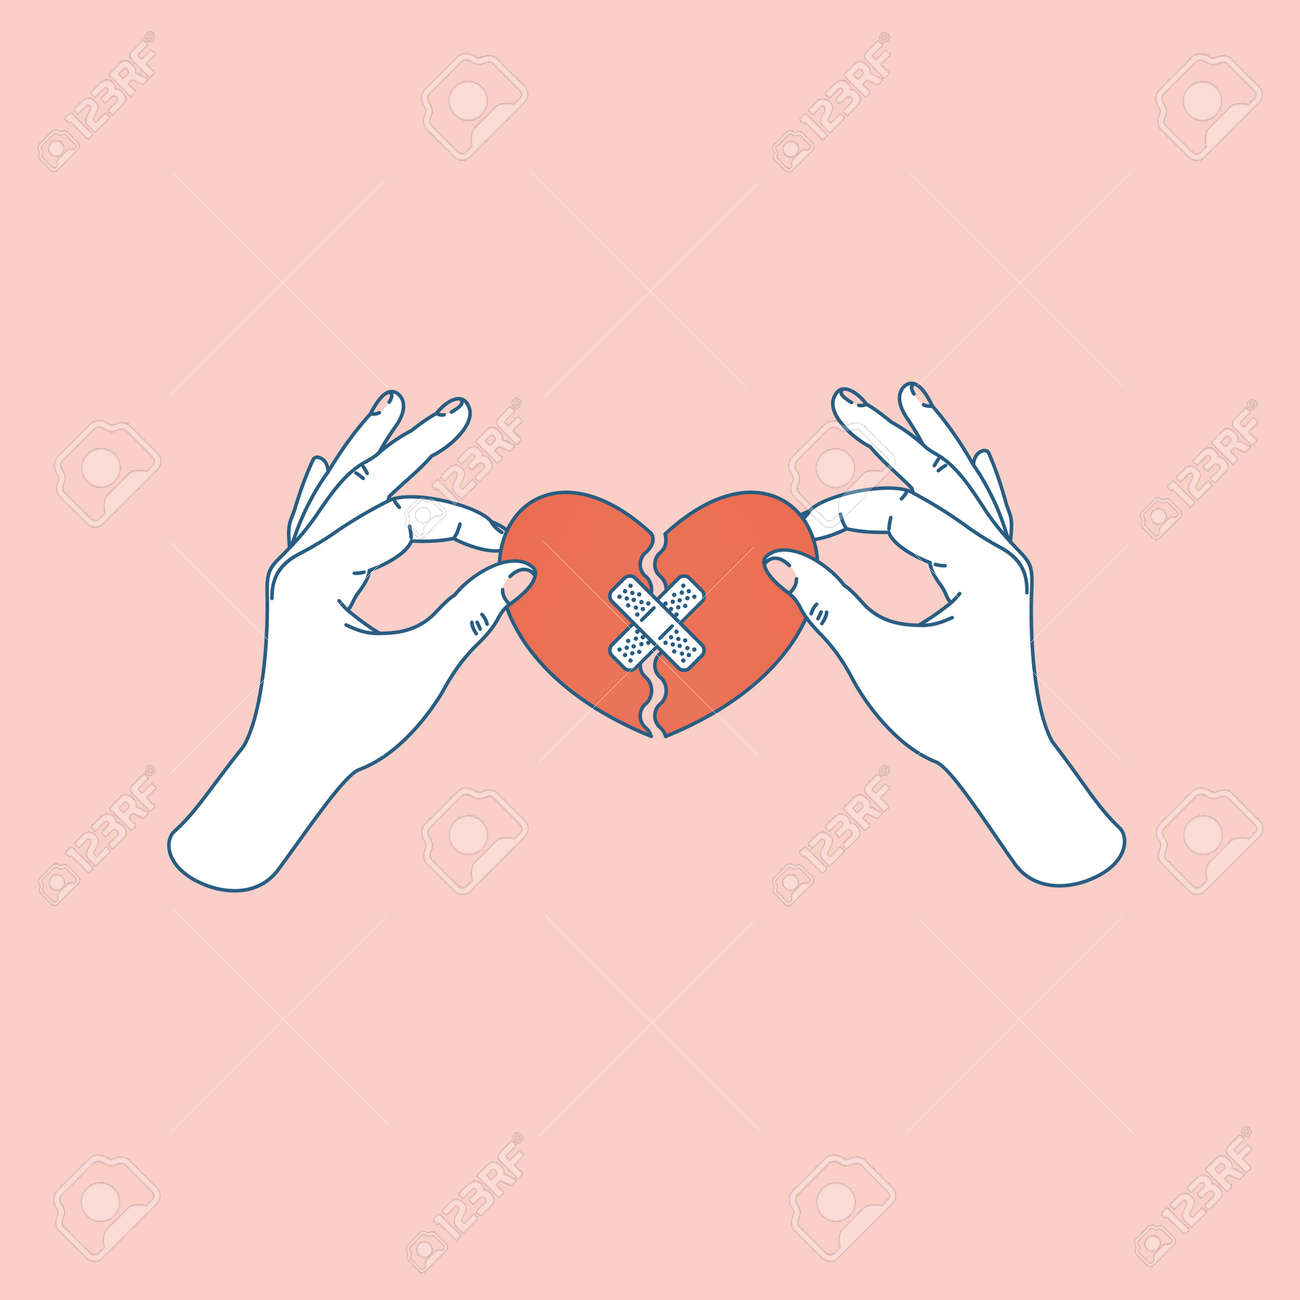 Woman hand holding repaired broken heart. Fixed broken heart. Vector illustration - 108640830